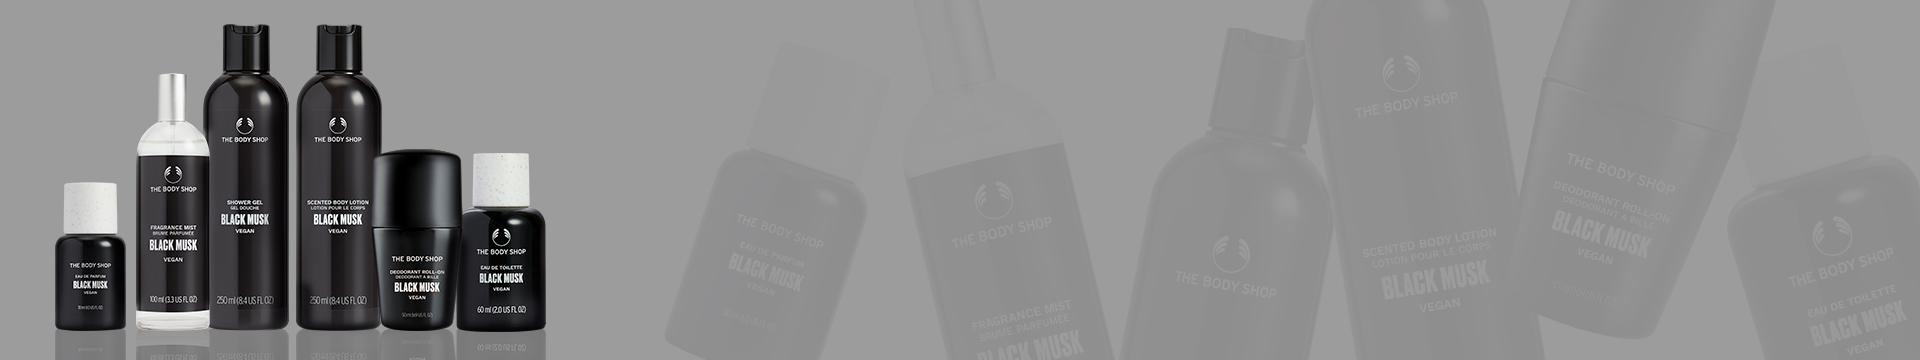 Black Musk